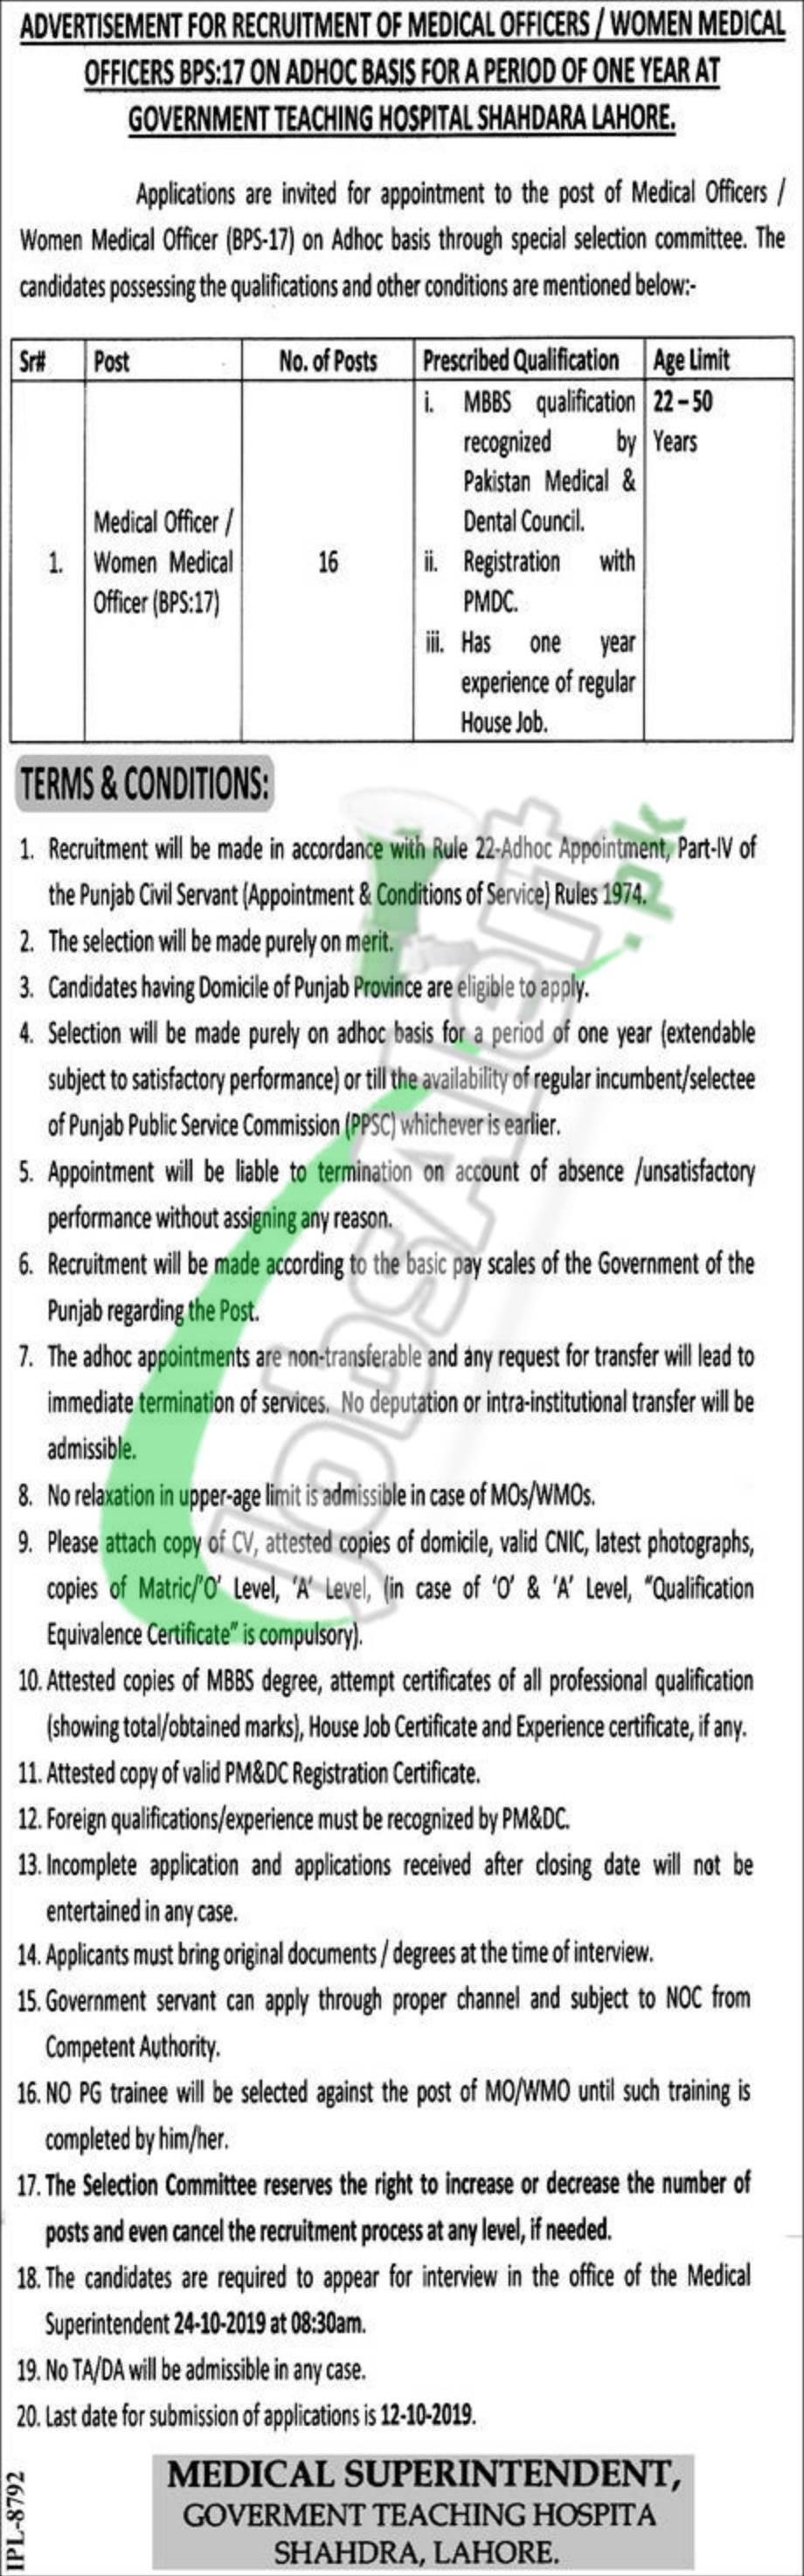 Govt Teaching Hospital Shahdara Lahore Jobs